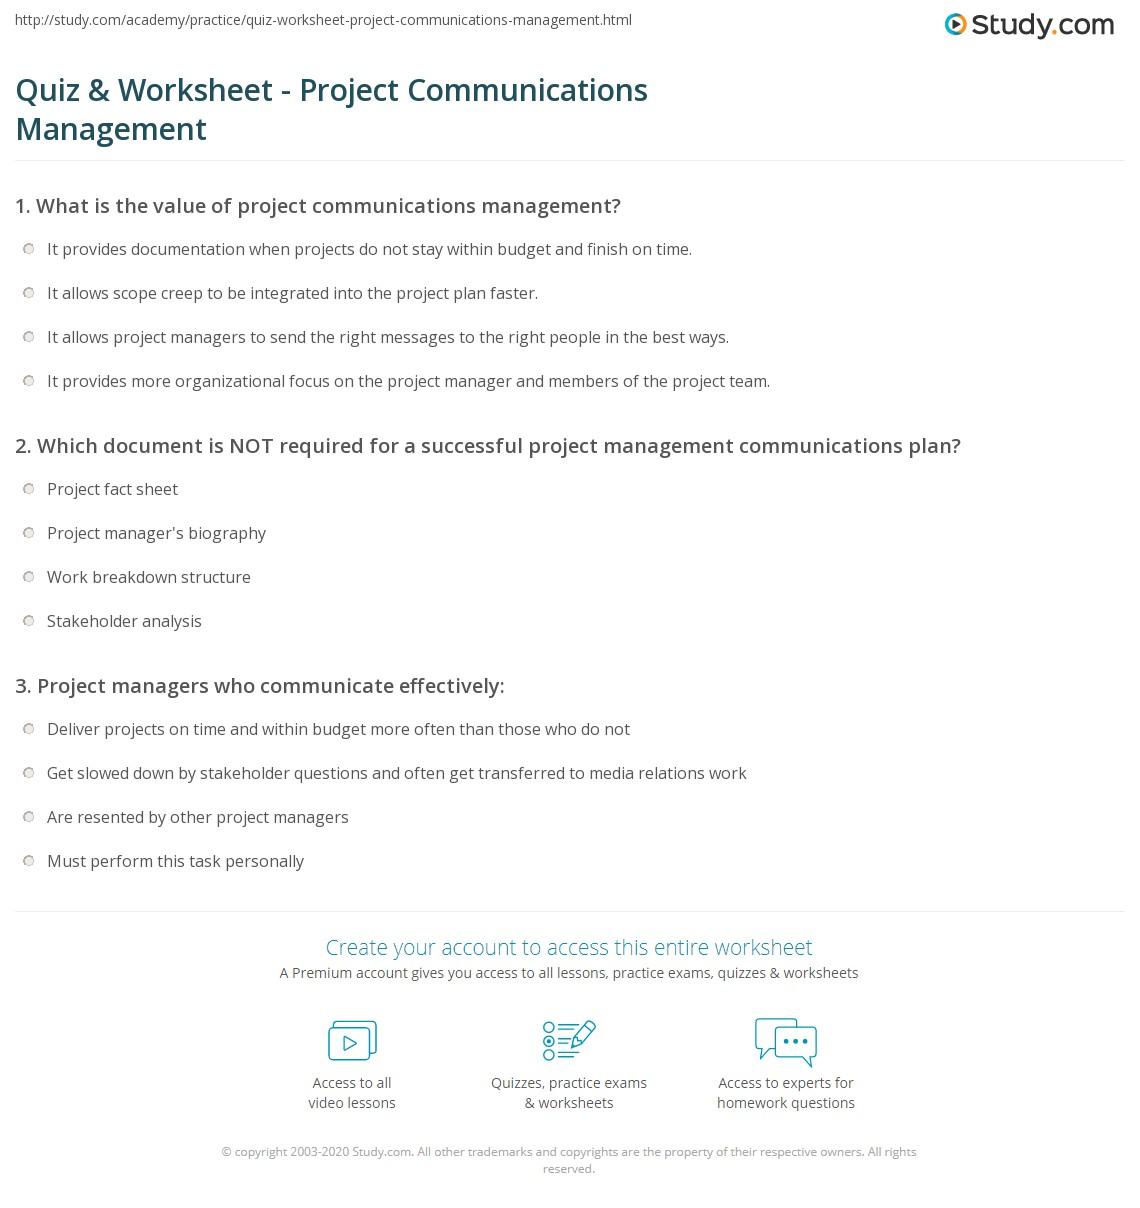 Quiz Worksheet Project Communications Management Study